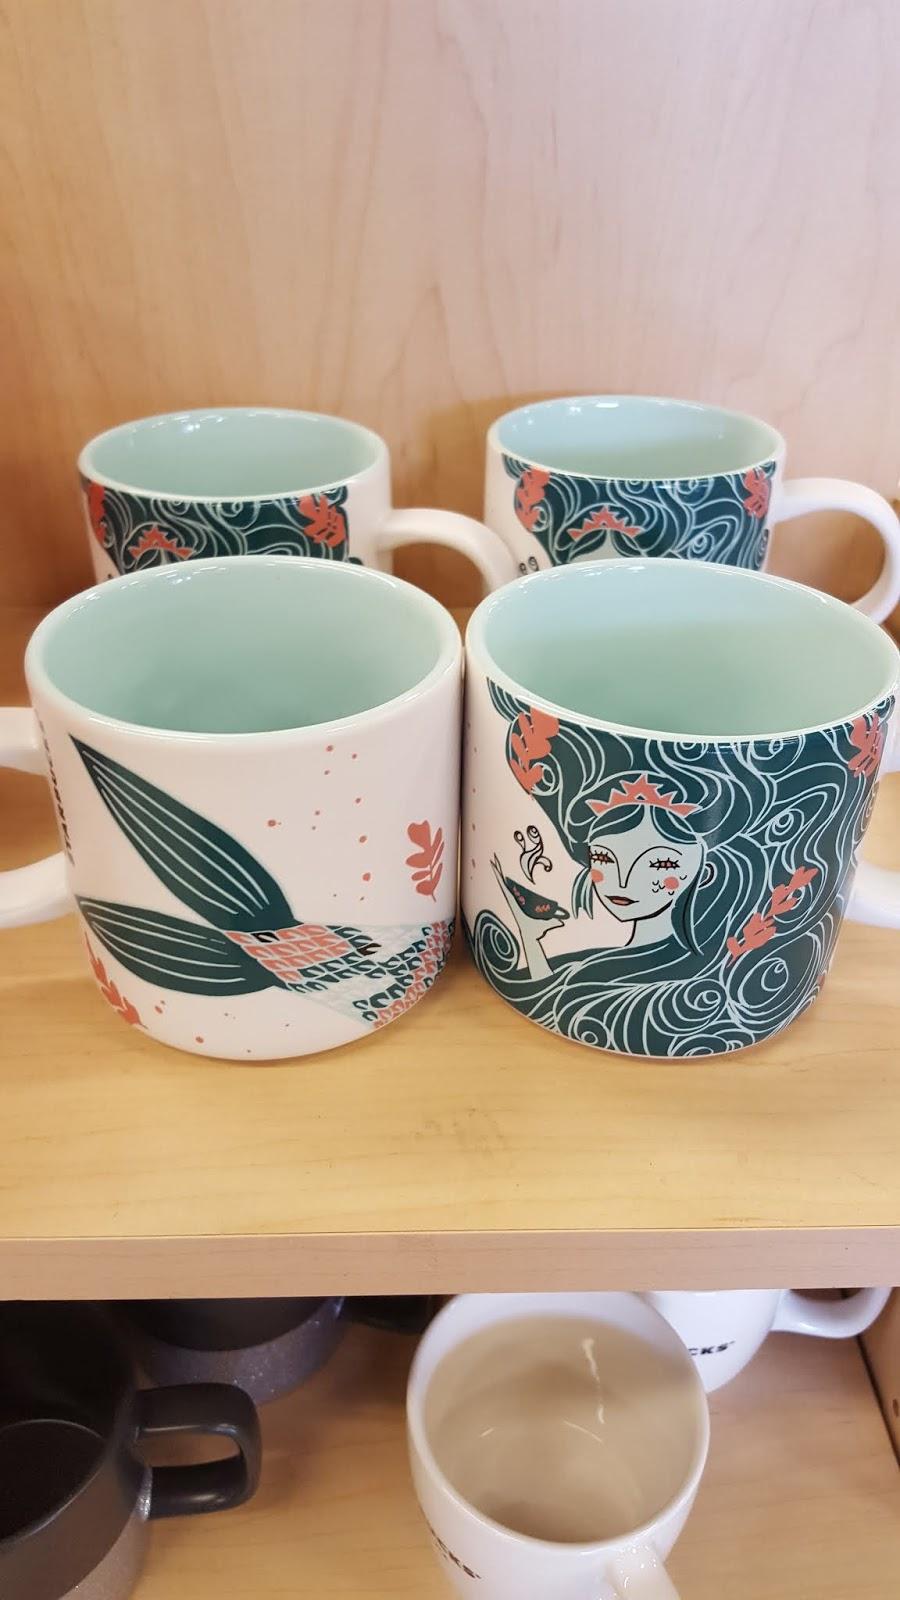 Starbucks - cafe  | Photo 4 of 10 | Address: 8805 Lakeview Pkwy, Rowlett, TX 75088, USA | Phone: (214) 607-0218